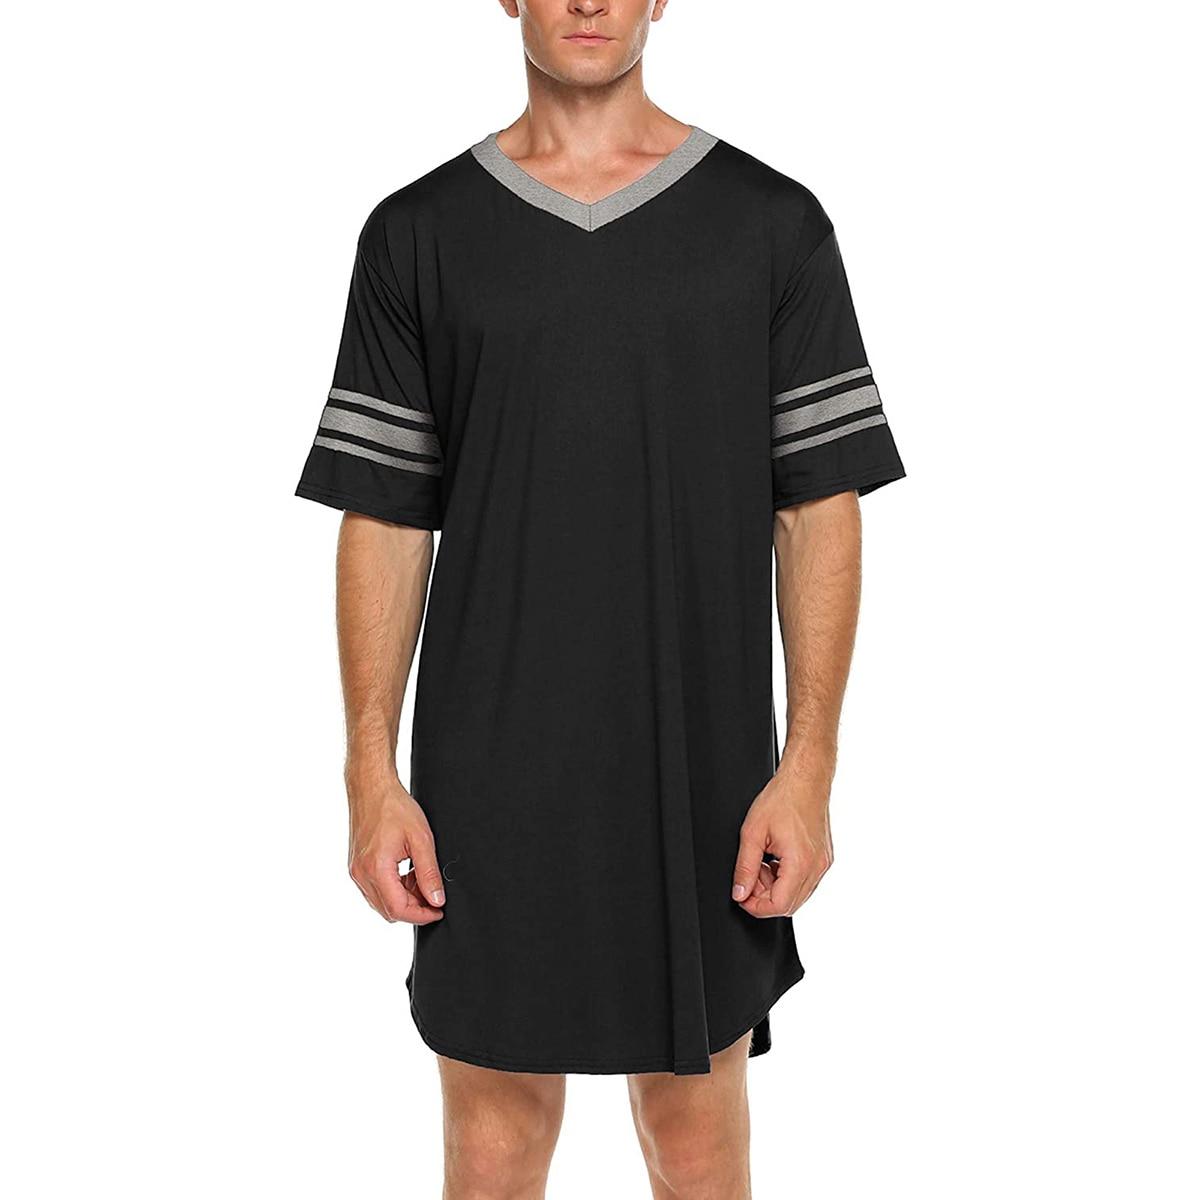 New Men Cotton Casual Short Sleeve Long Nightshirt Soft Loose Nightwear Sleepwear Blue/ Grey/ Black/ Red